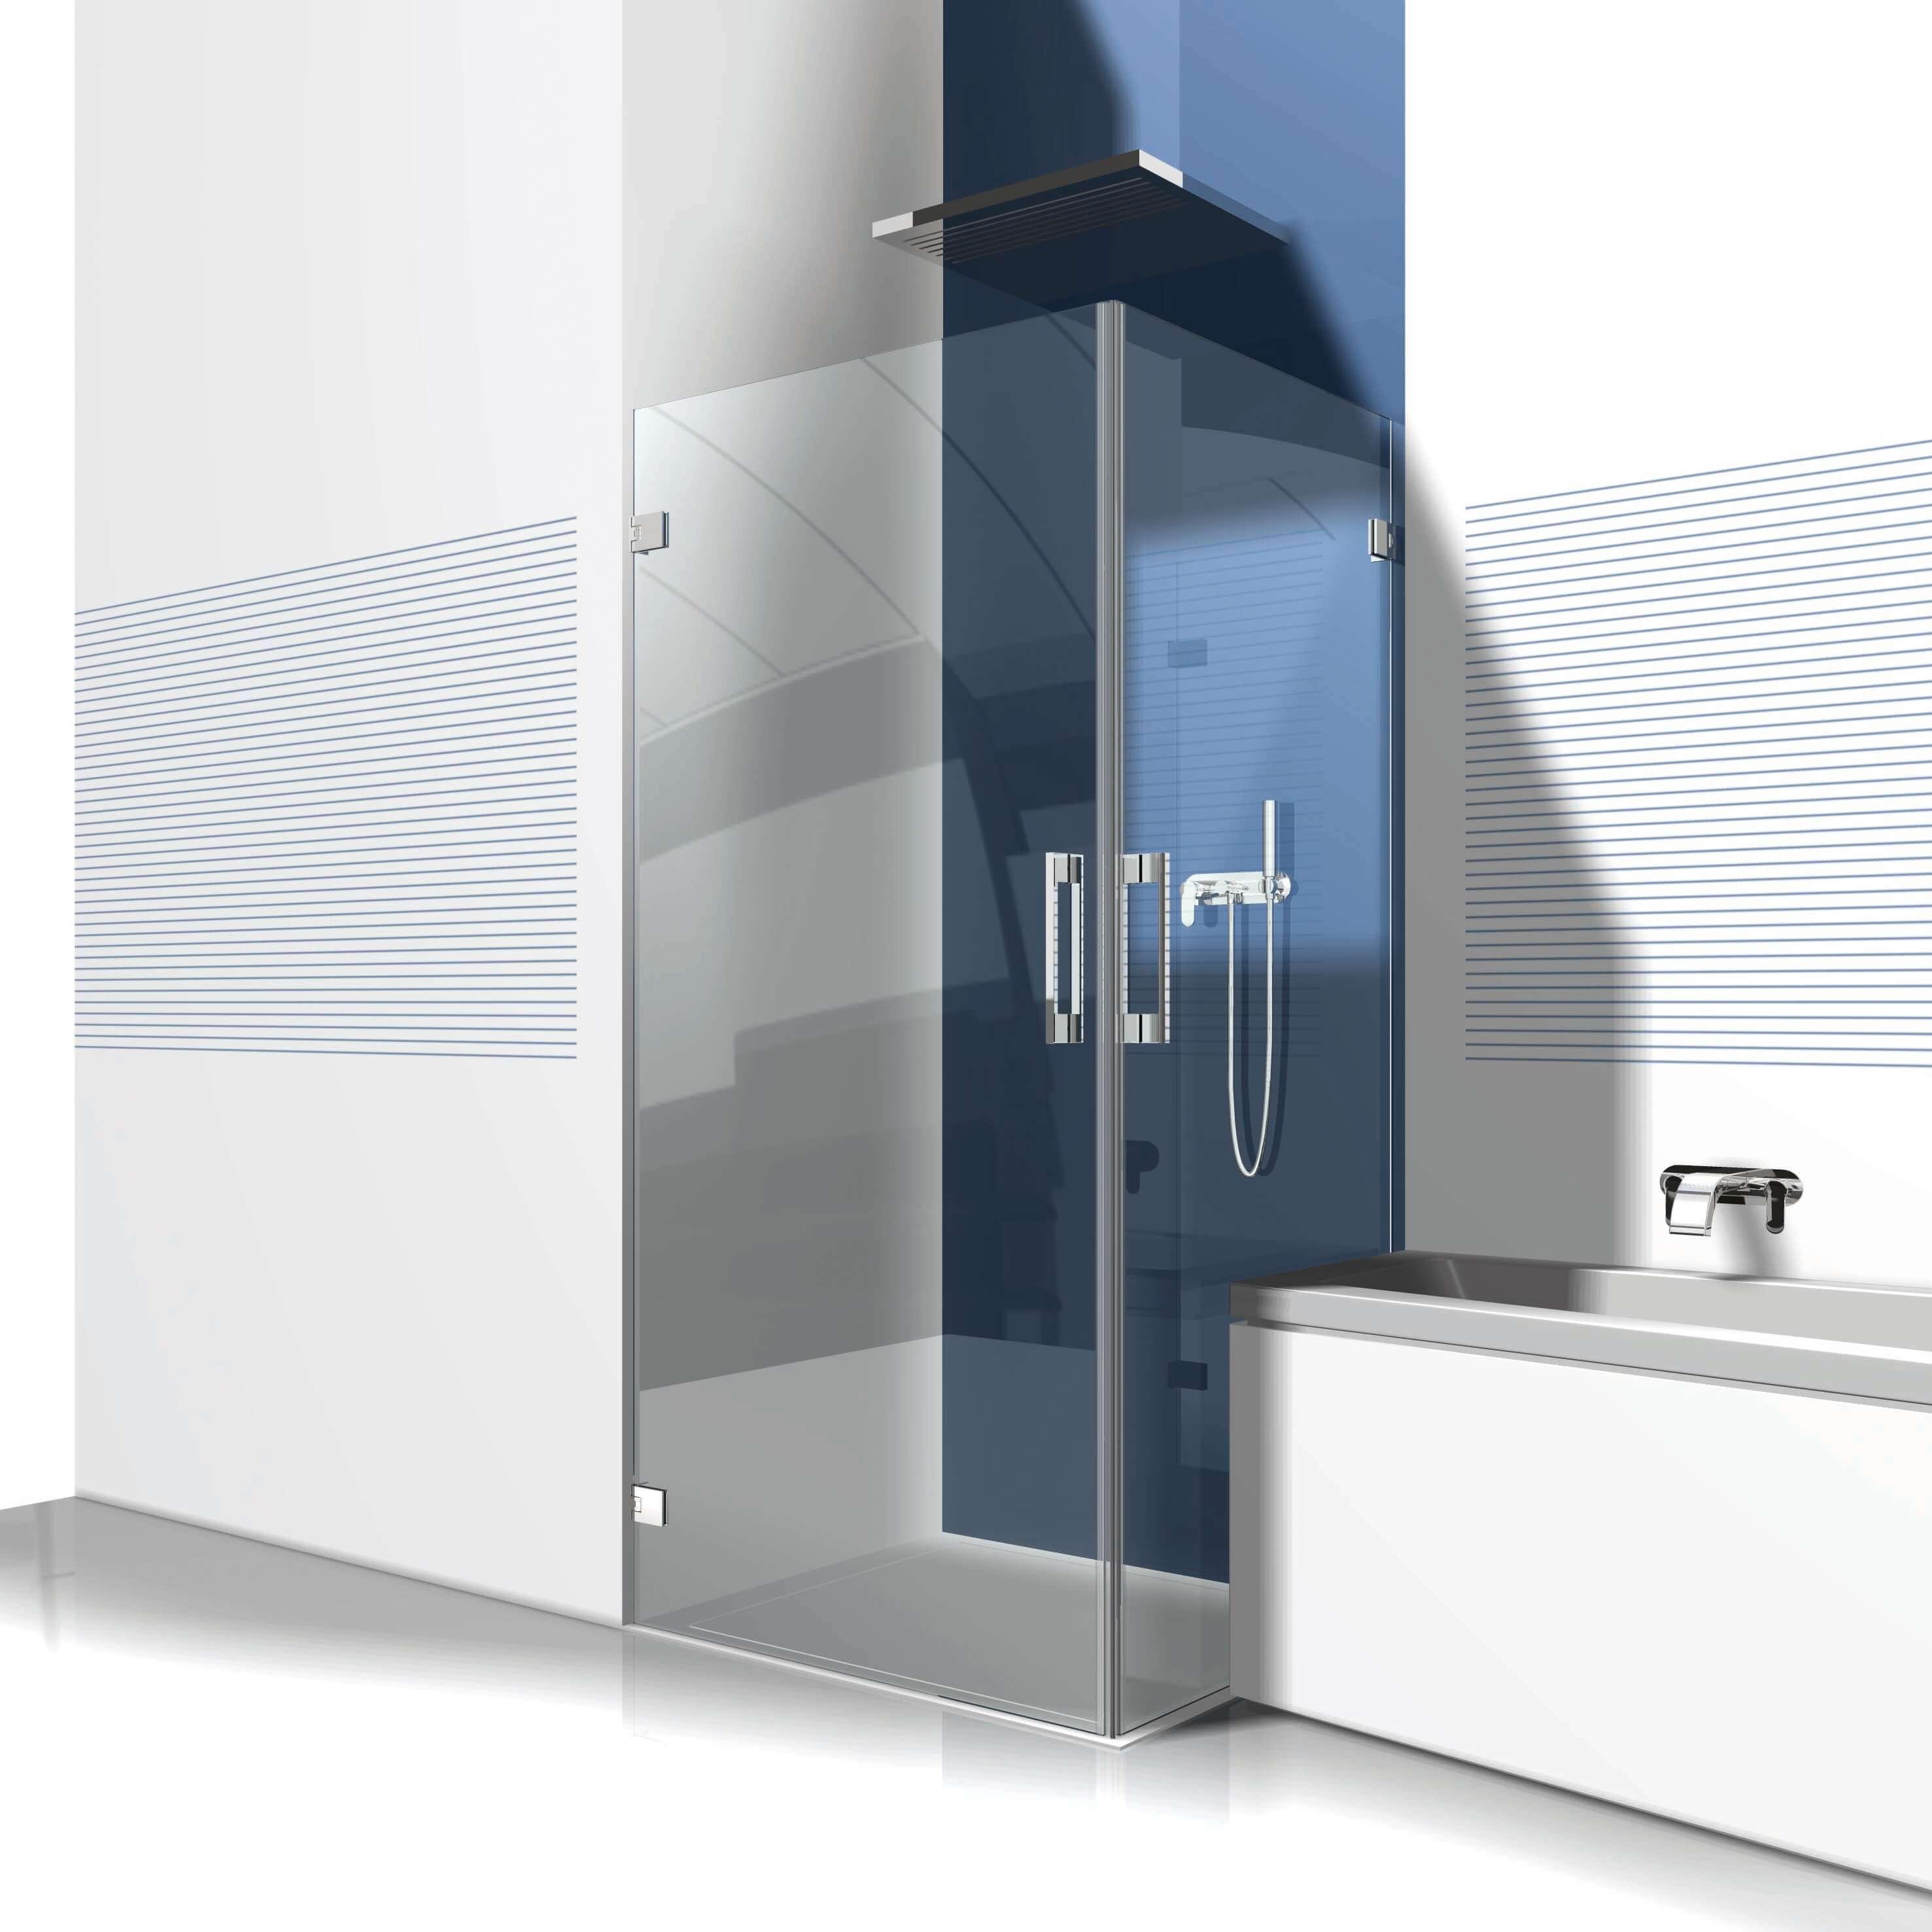 Badwannen-Duschen-Kombination